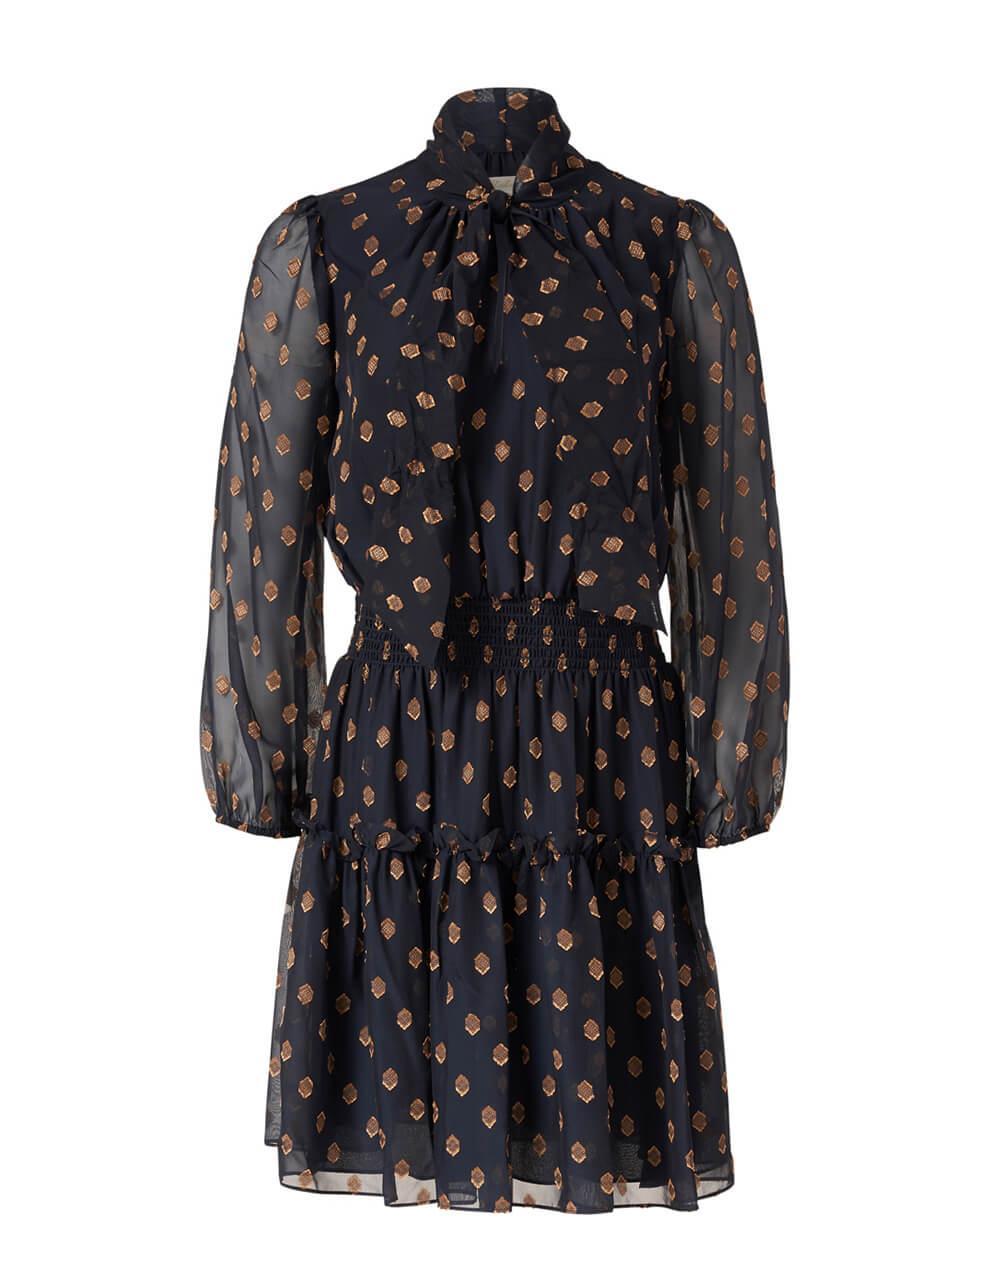 Dane Dress Item # 4629014